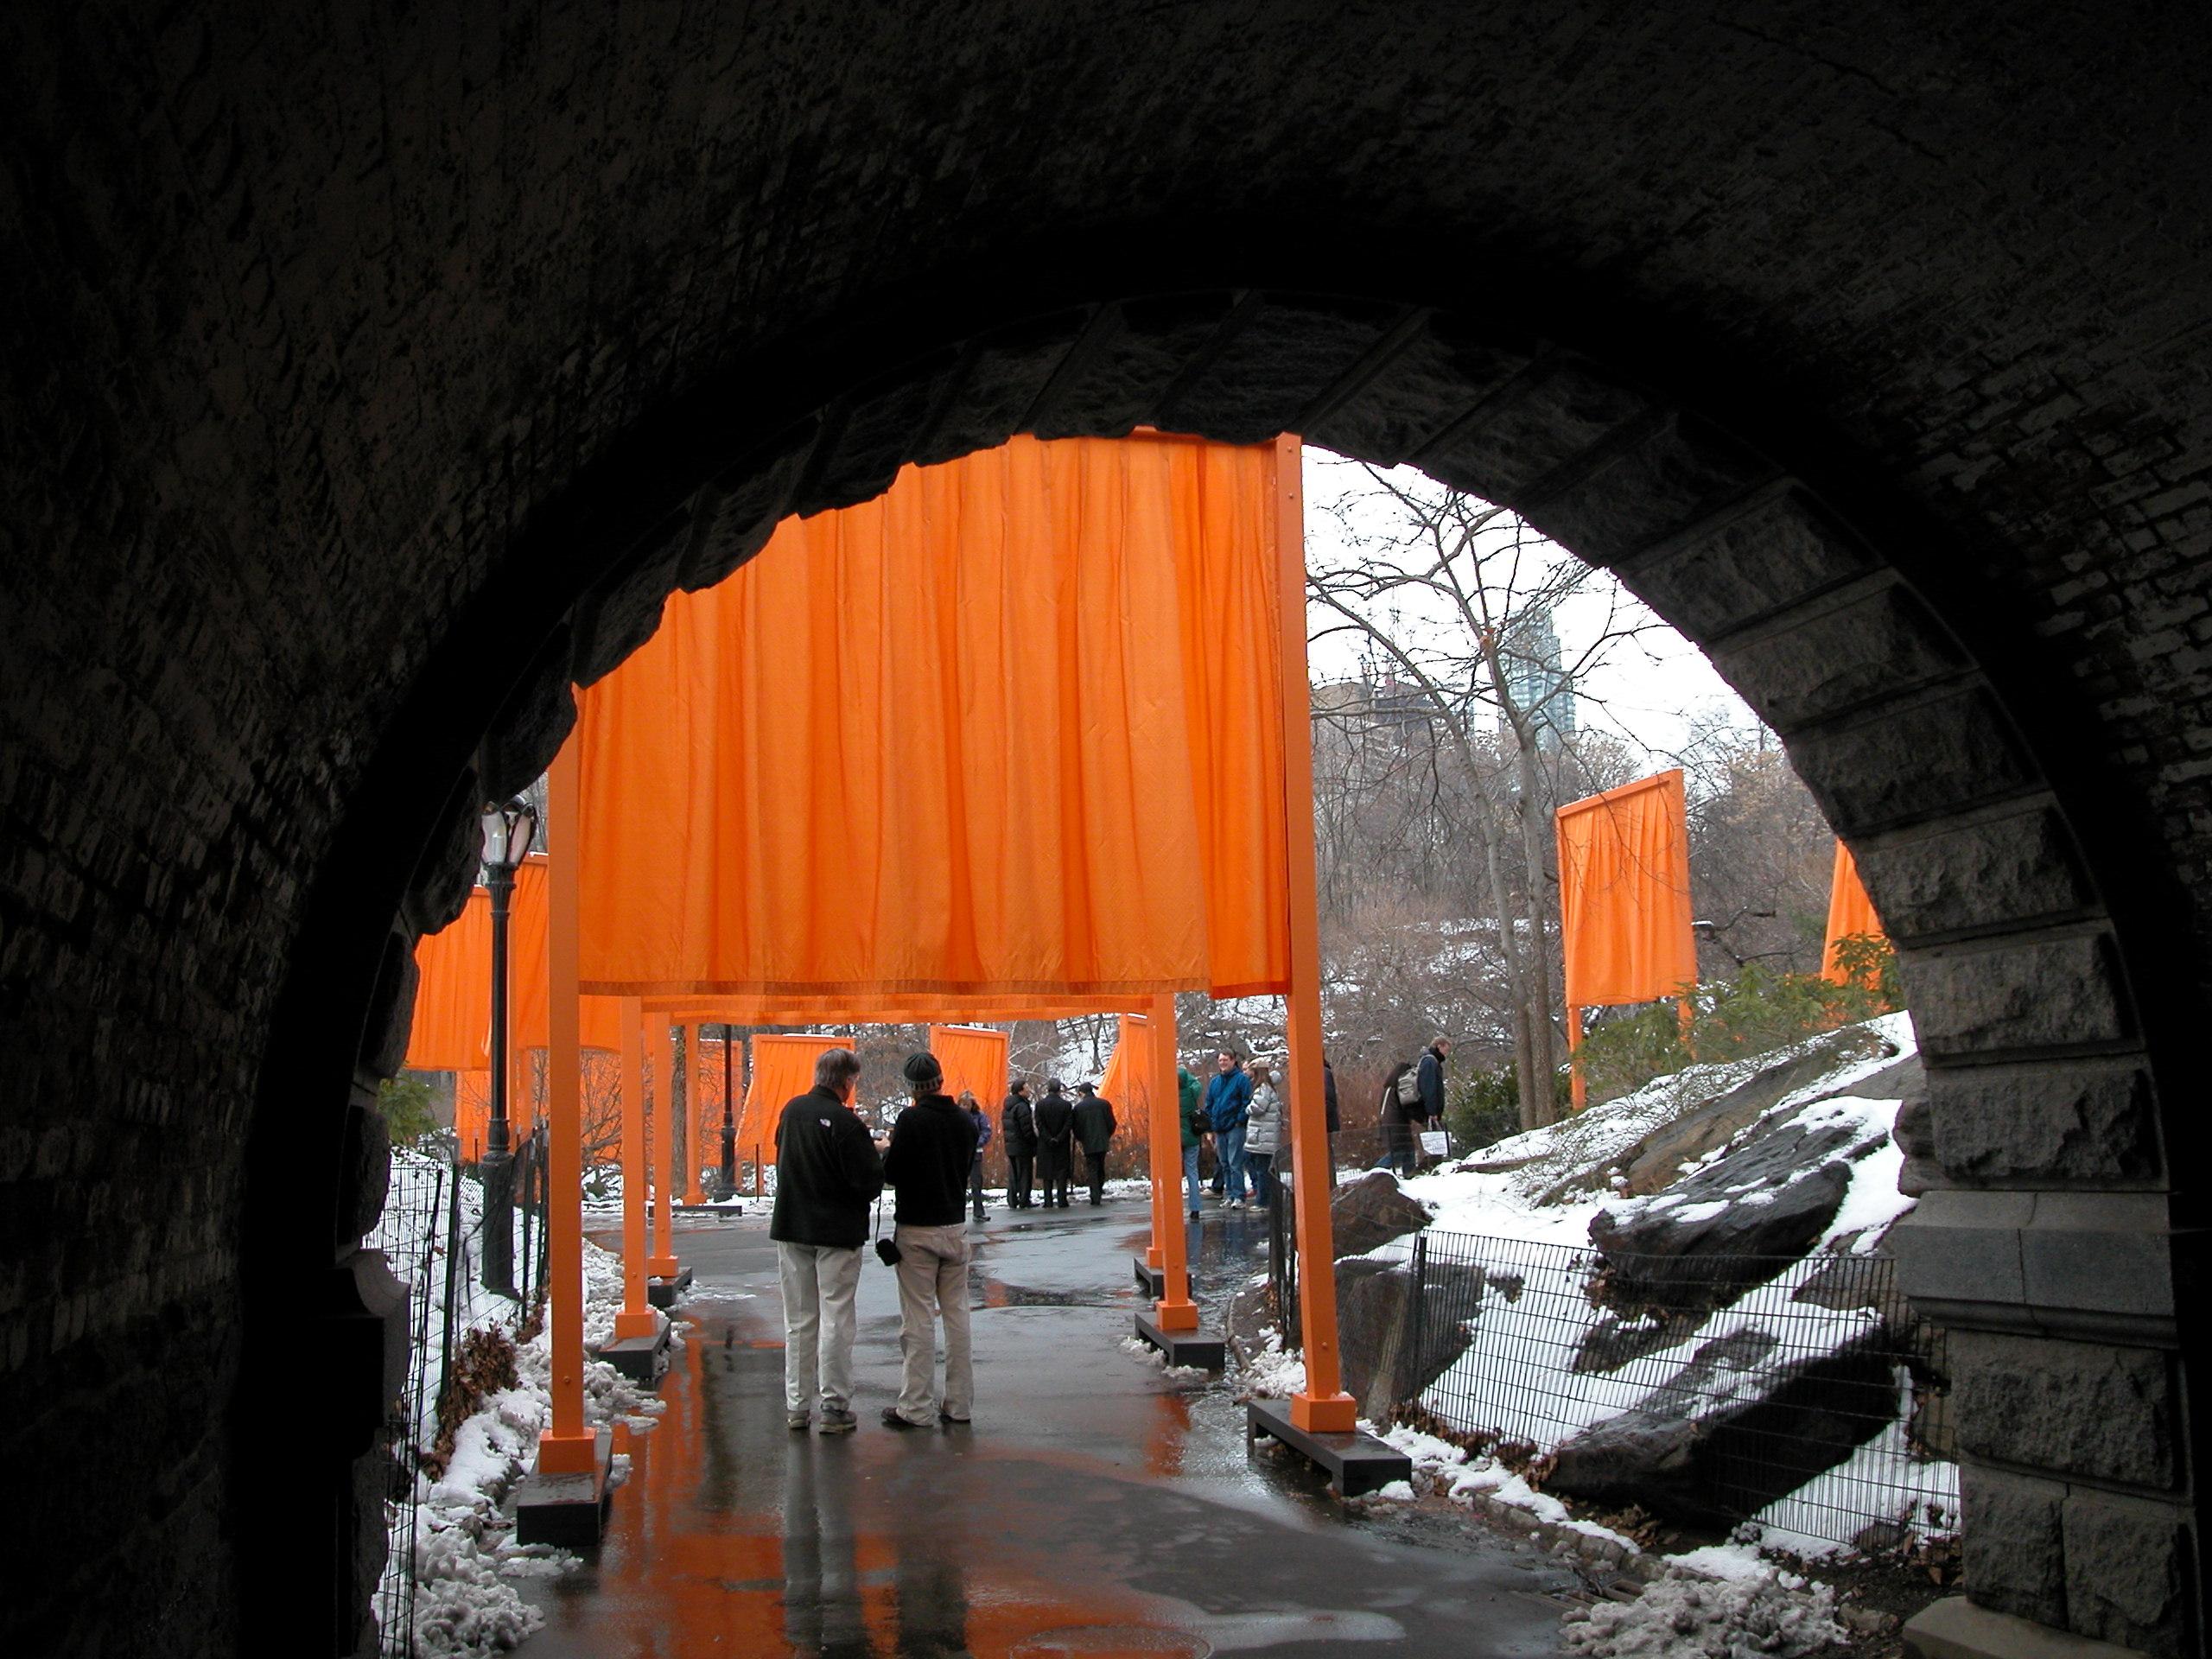 The Gates - Central Park 02-2005 018